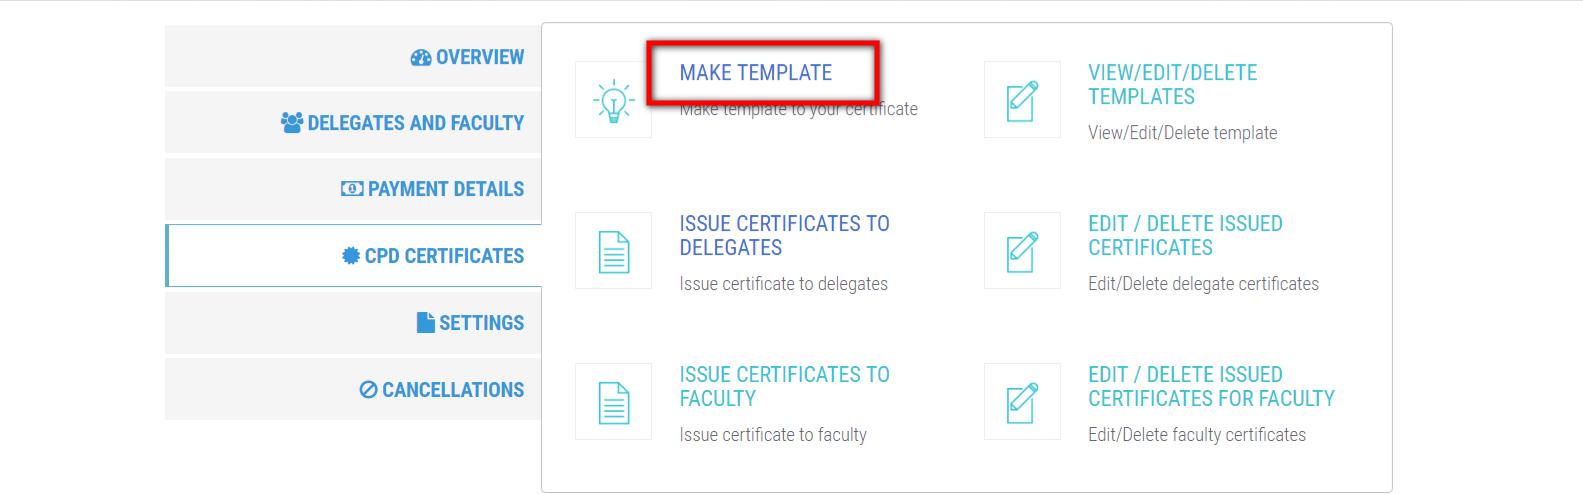 make certificate template bookcpd com